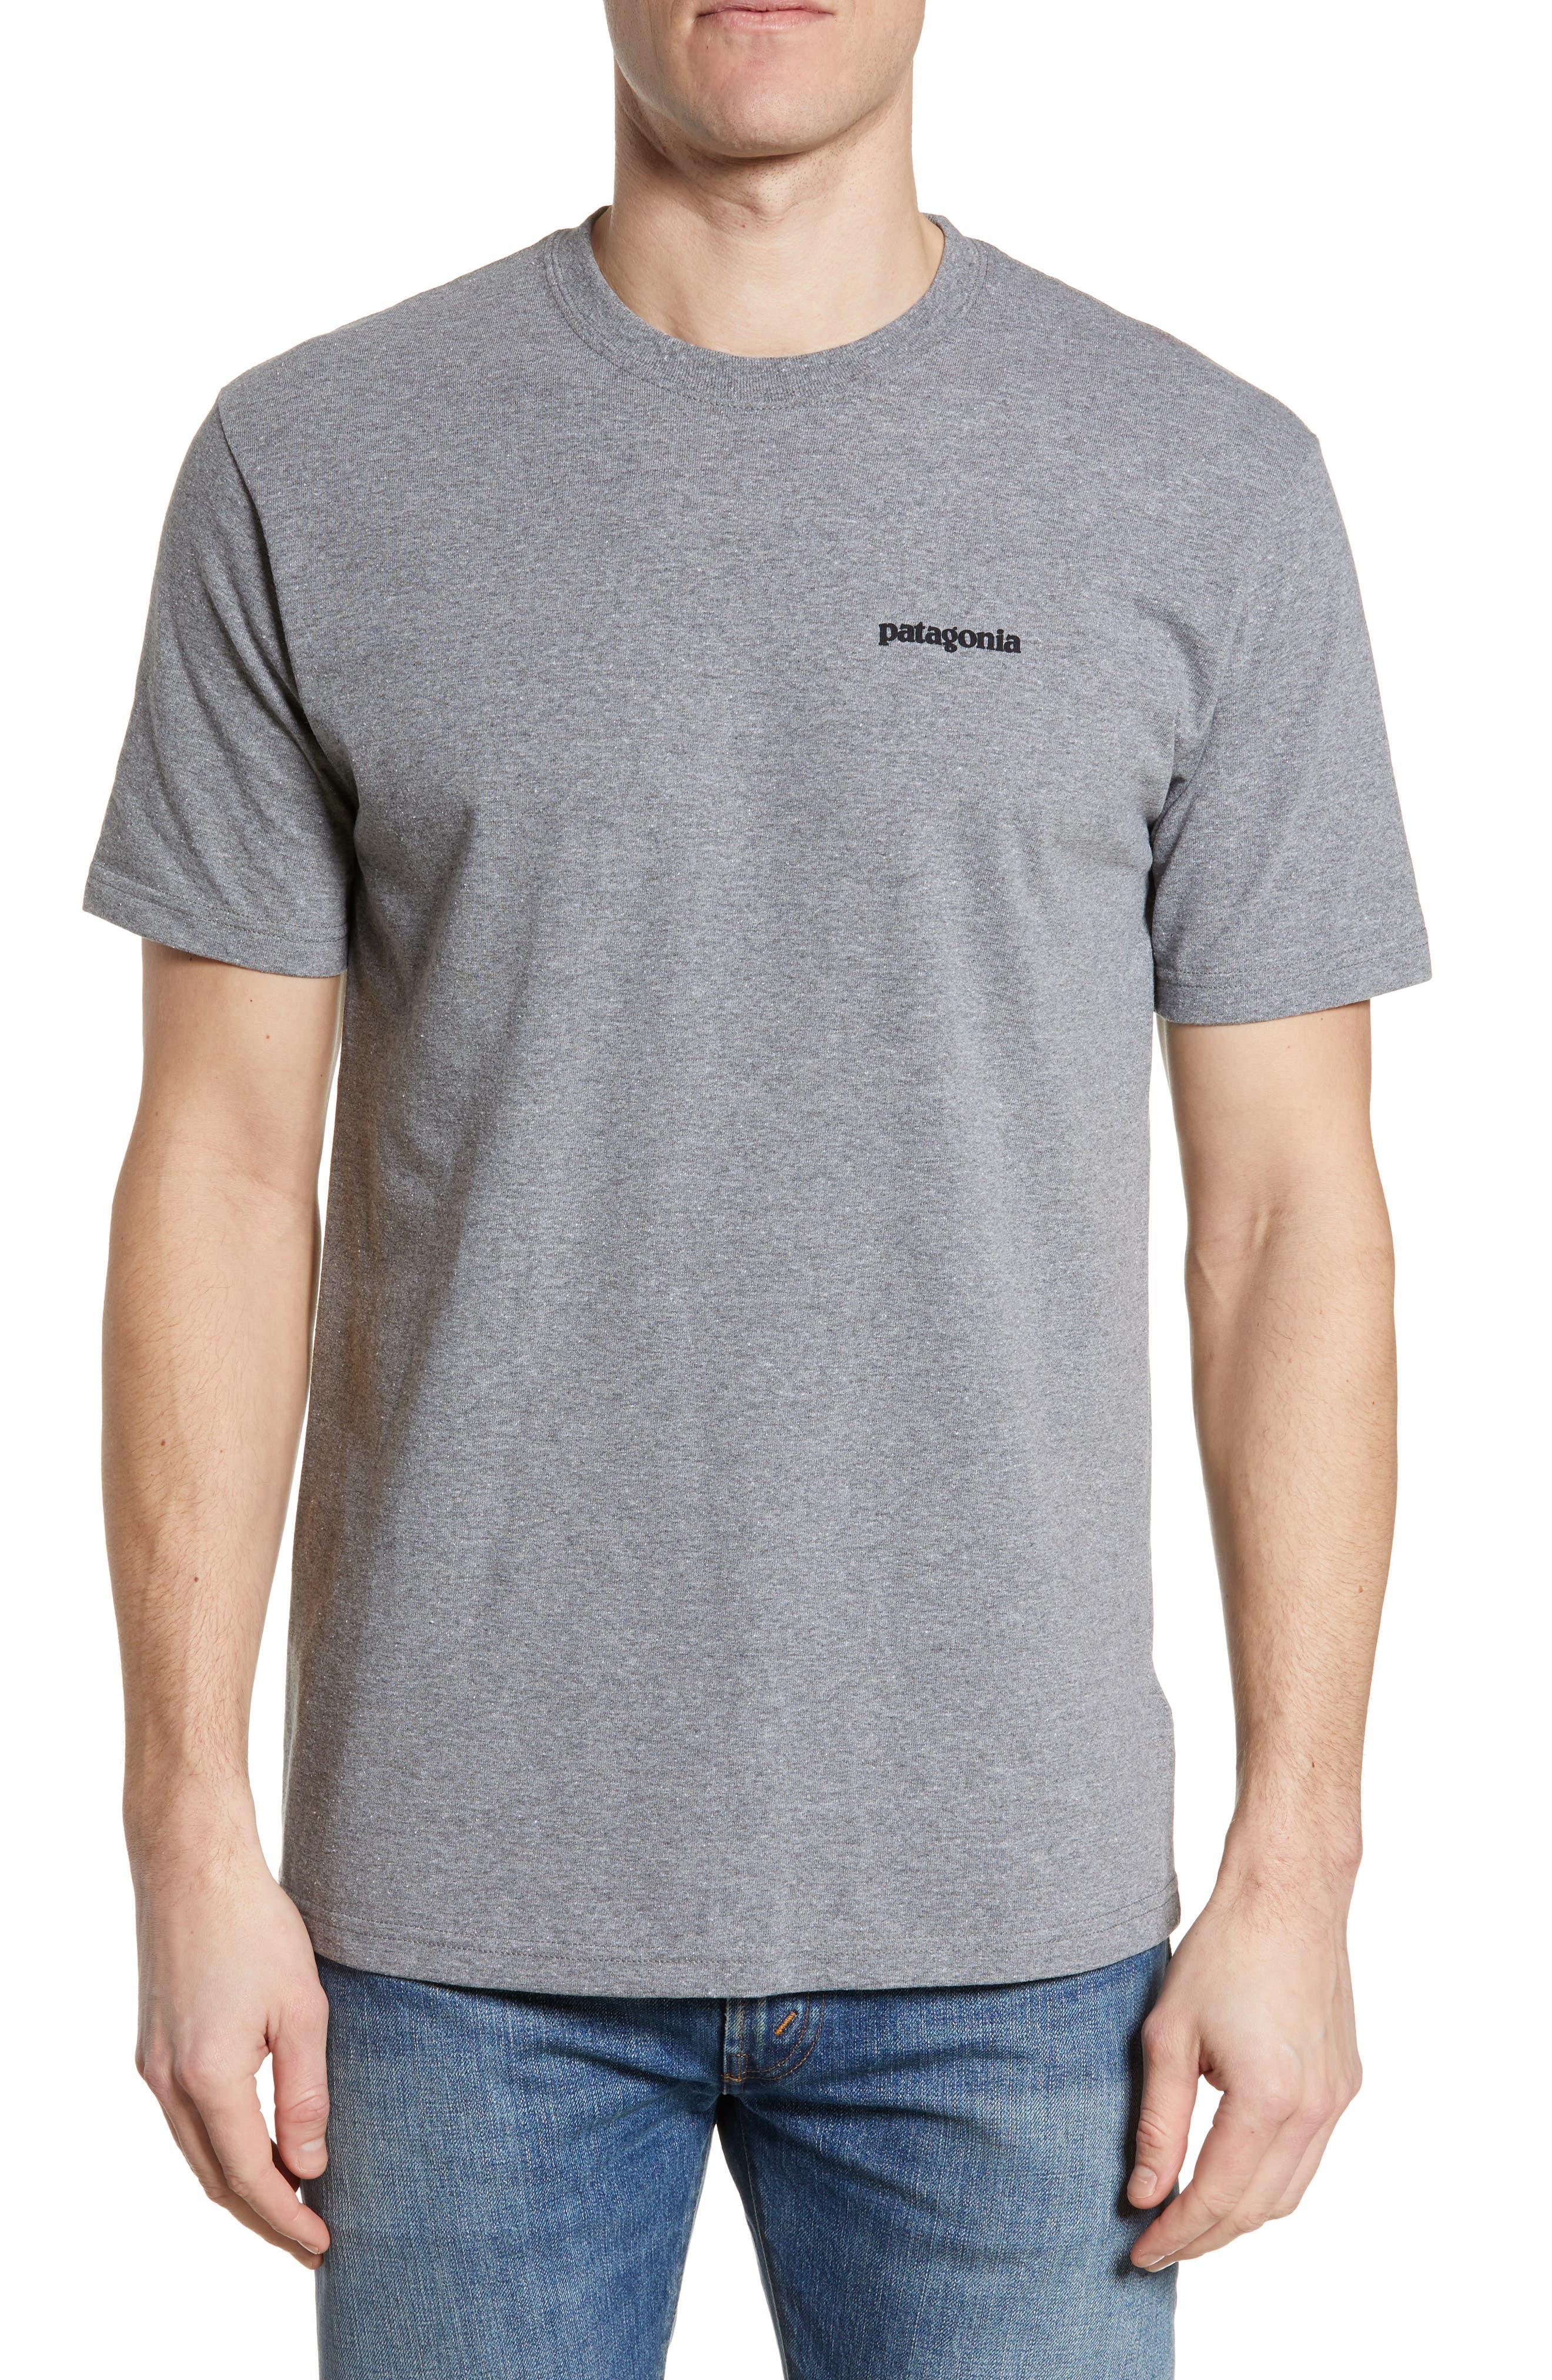 PATAGONIA,                             Fitz Roy Trout Crewneck T-Shirt,                             Main thumbnail 1, color,                             GRAVEL HEATHER